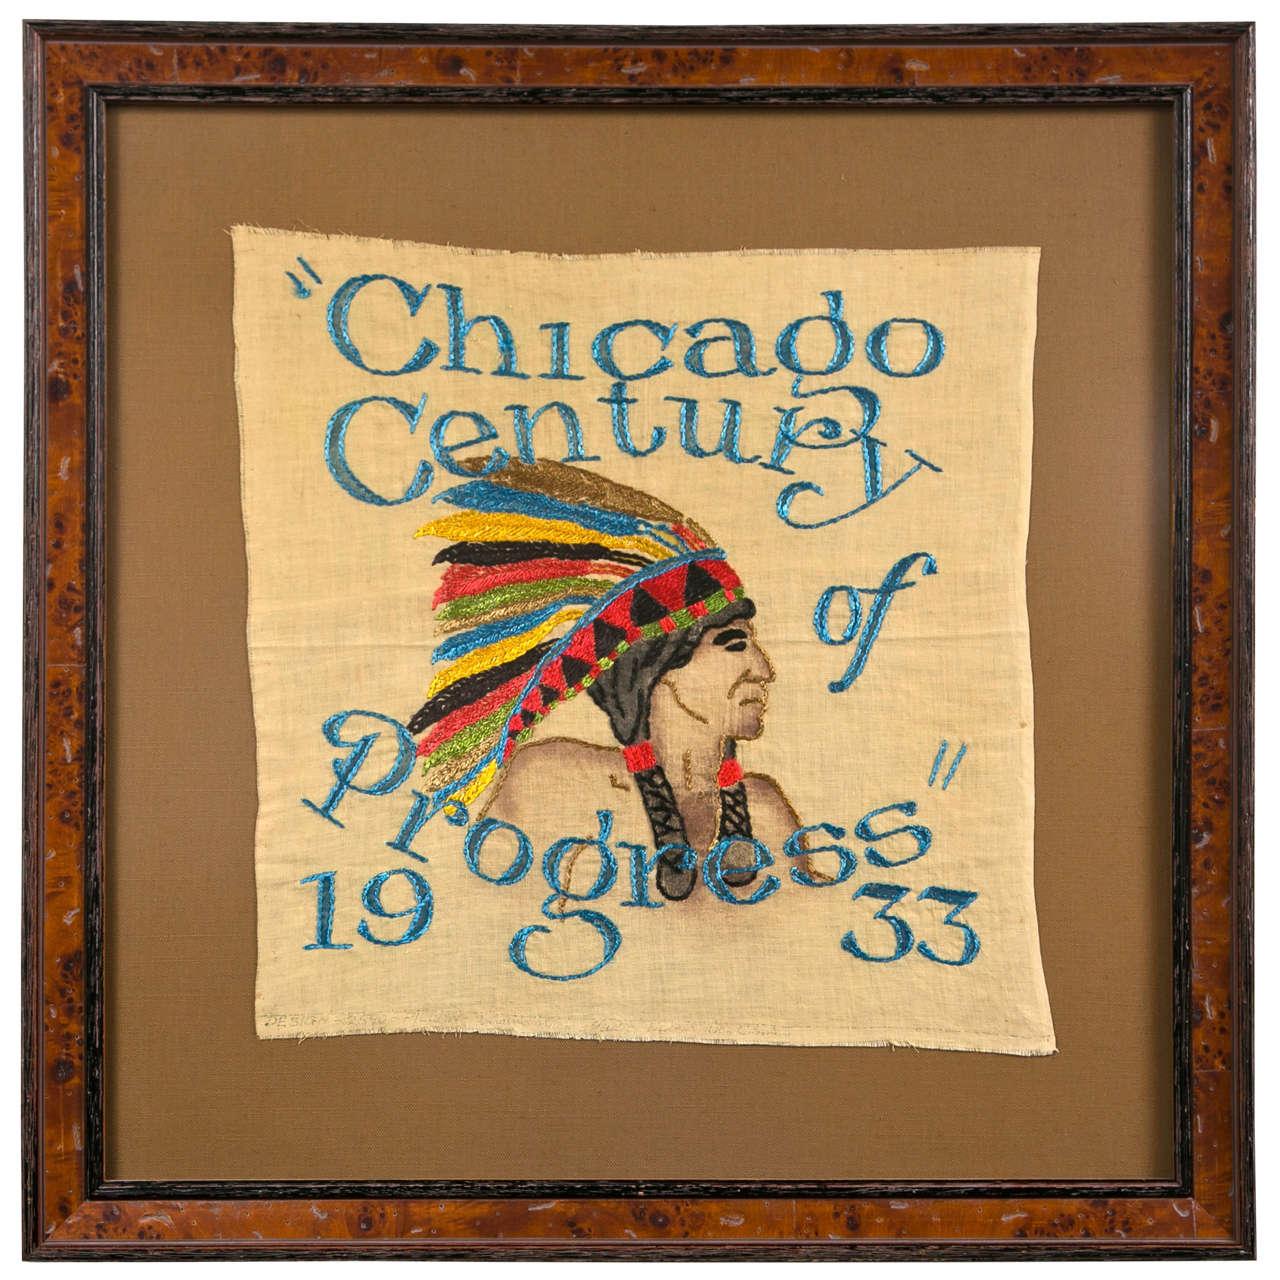 1933 Chicago Century Framed Needlepoint